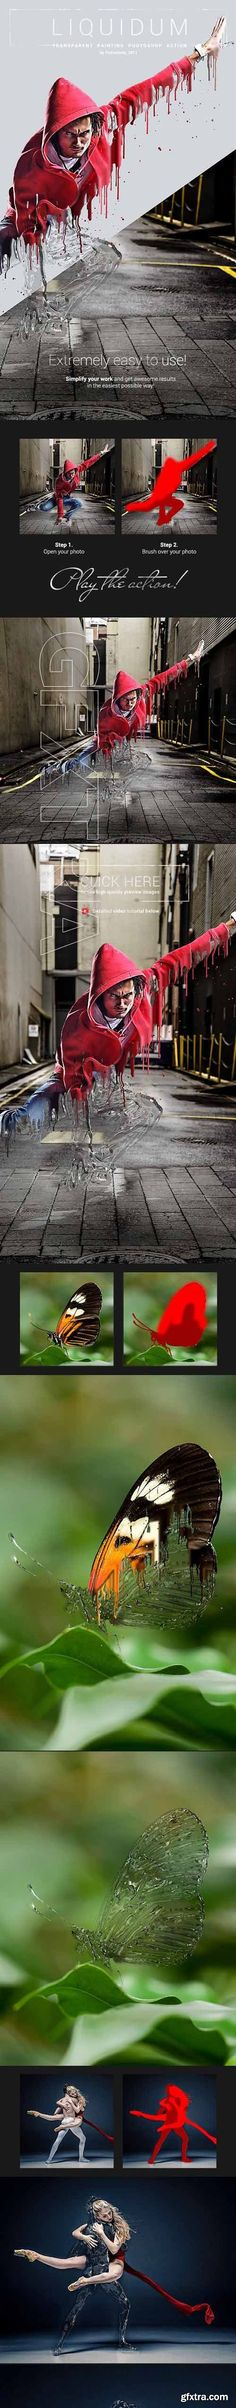 GraphicRiver - Liquidum - Transparent Painting Photoshop Action 20306902